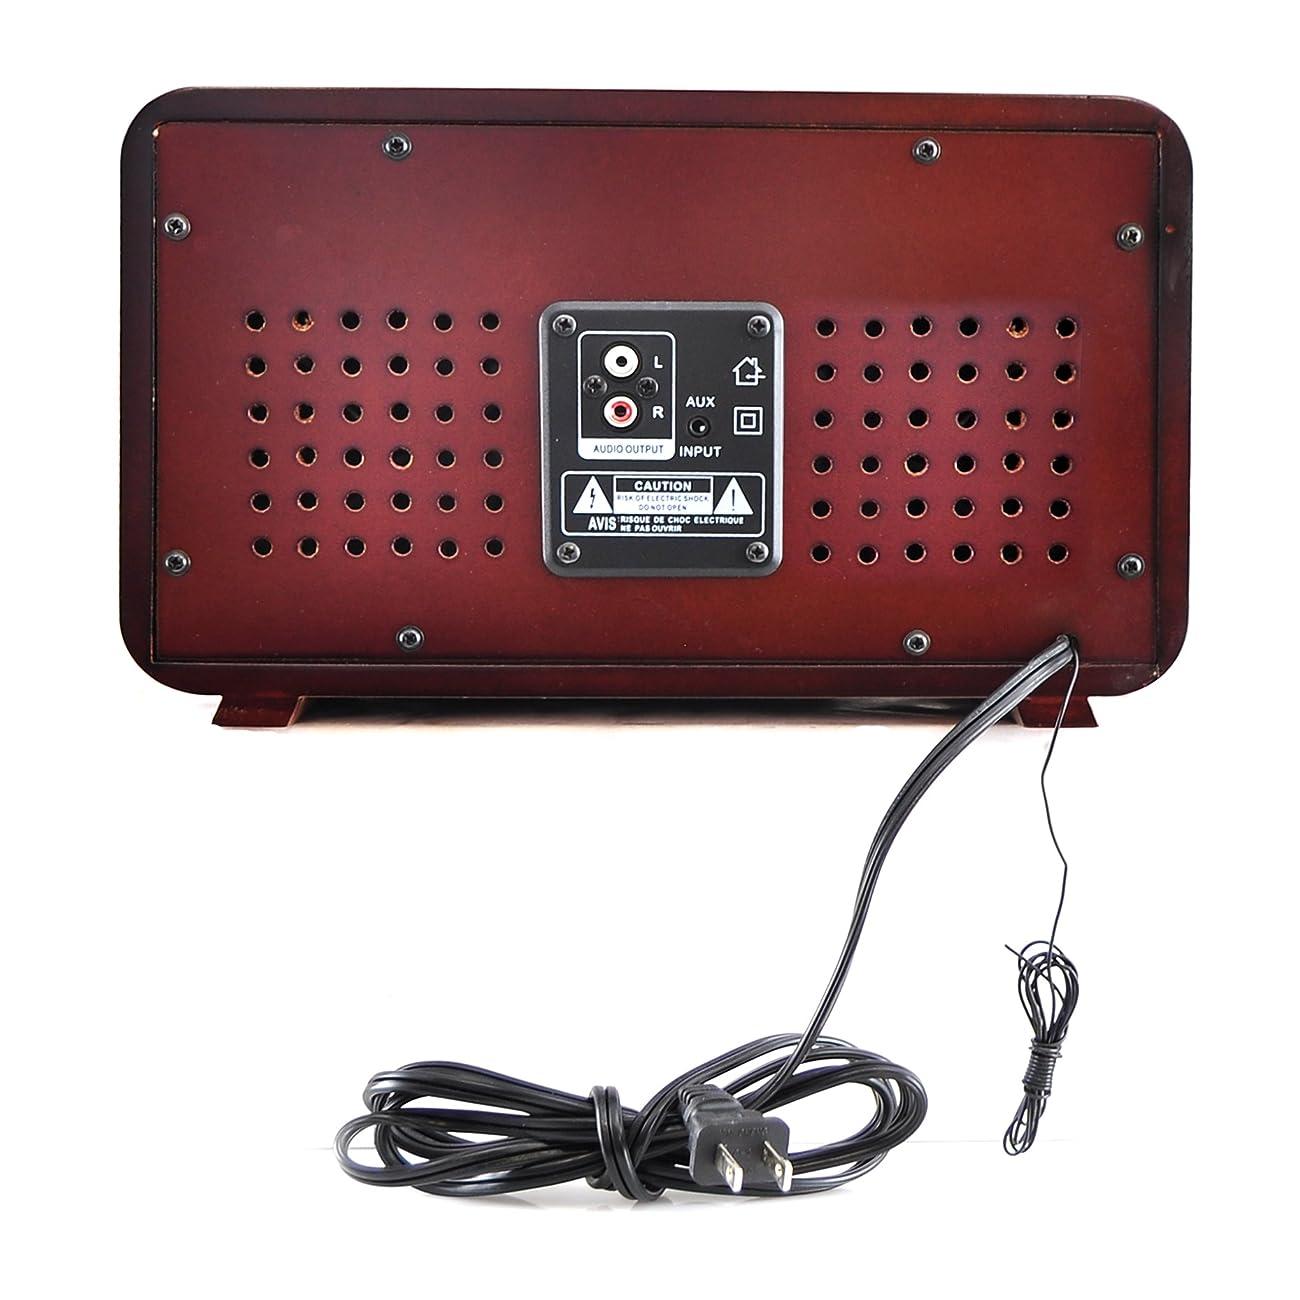 Pyle PUNP34BT Vintage Retro Classic Style Bluetooth Radio Sound System, USB/SD Readers, AM/FM Radio 3